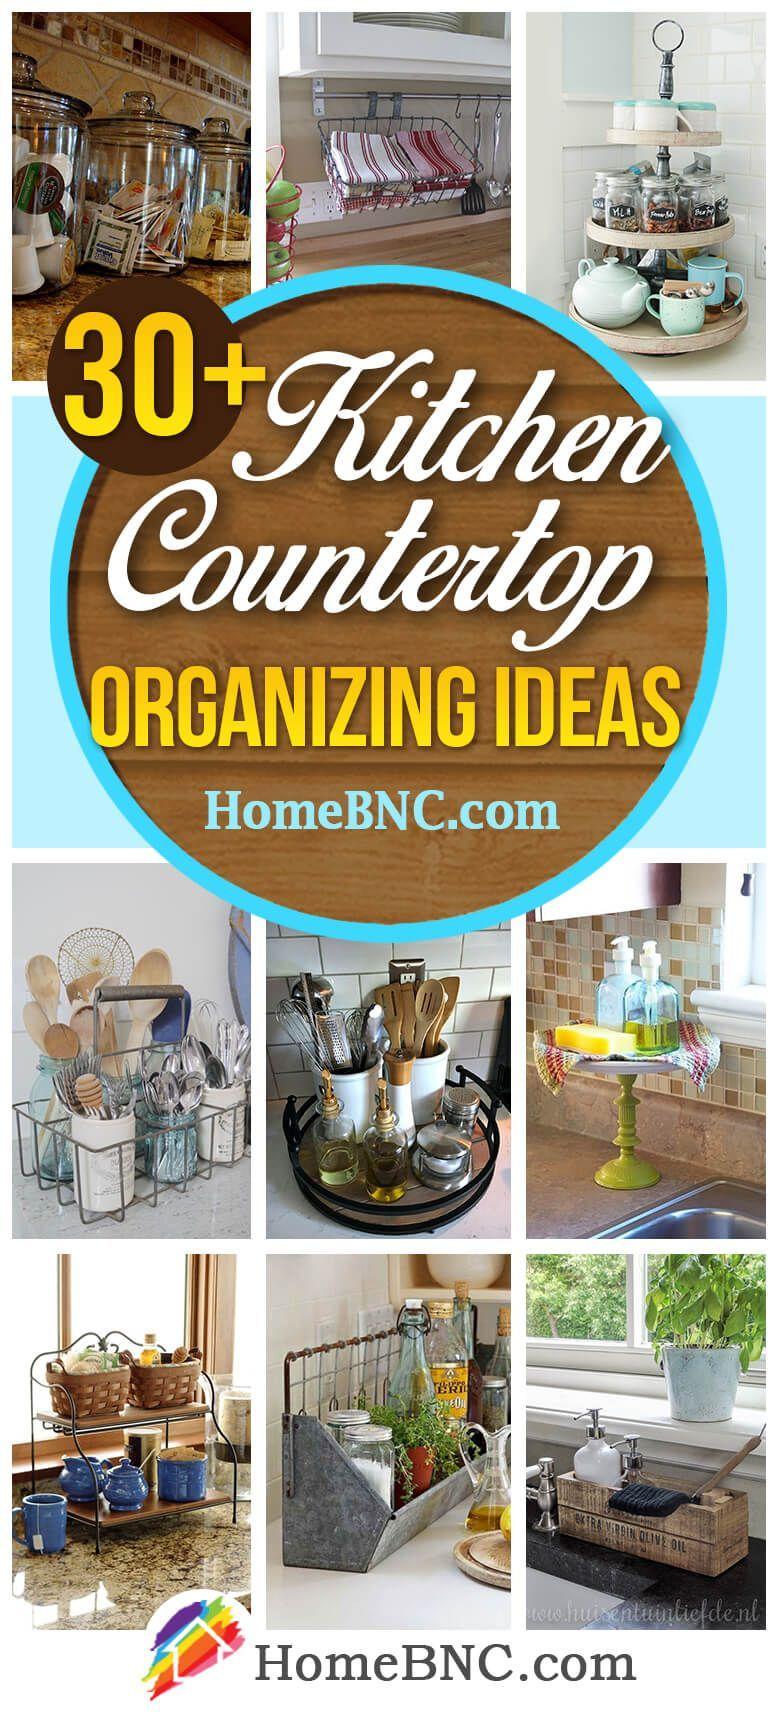 34 inventive kitchen countertop organizing ideas to keep your space neat kitchen countertop on kitchen counter organization id=48203